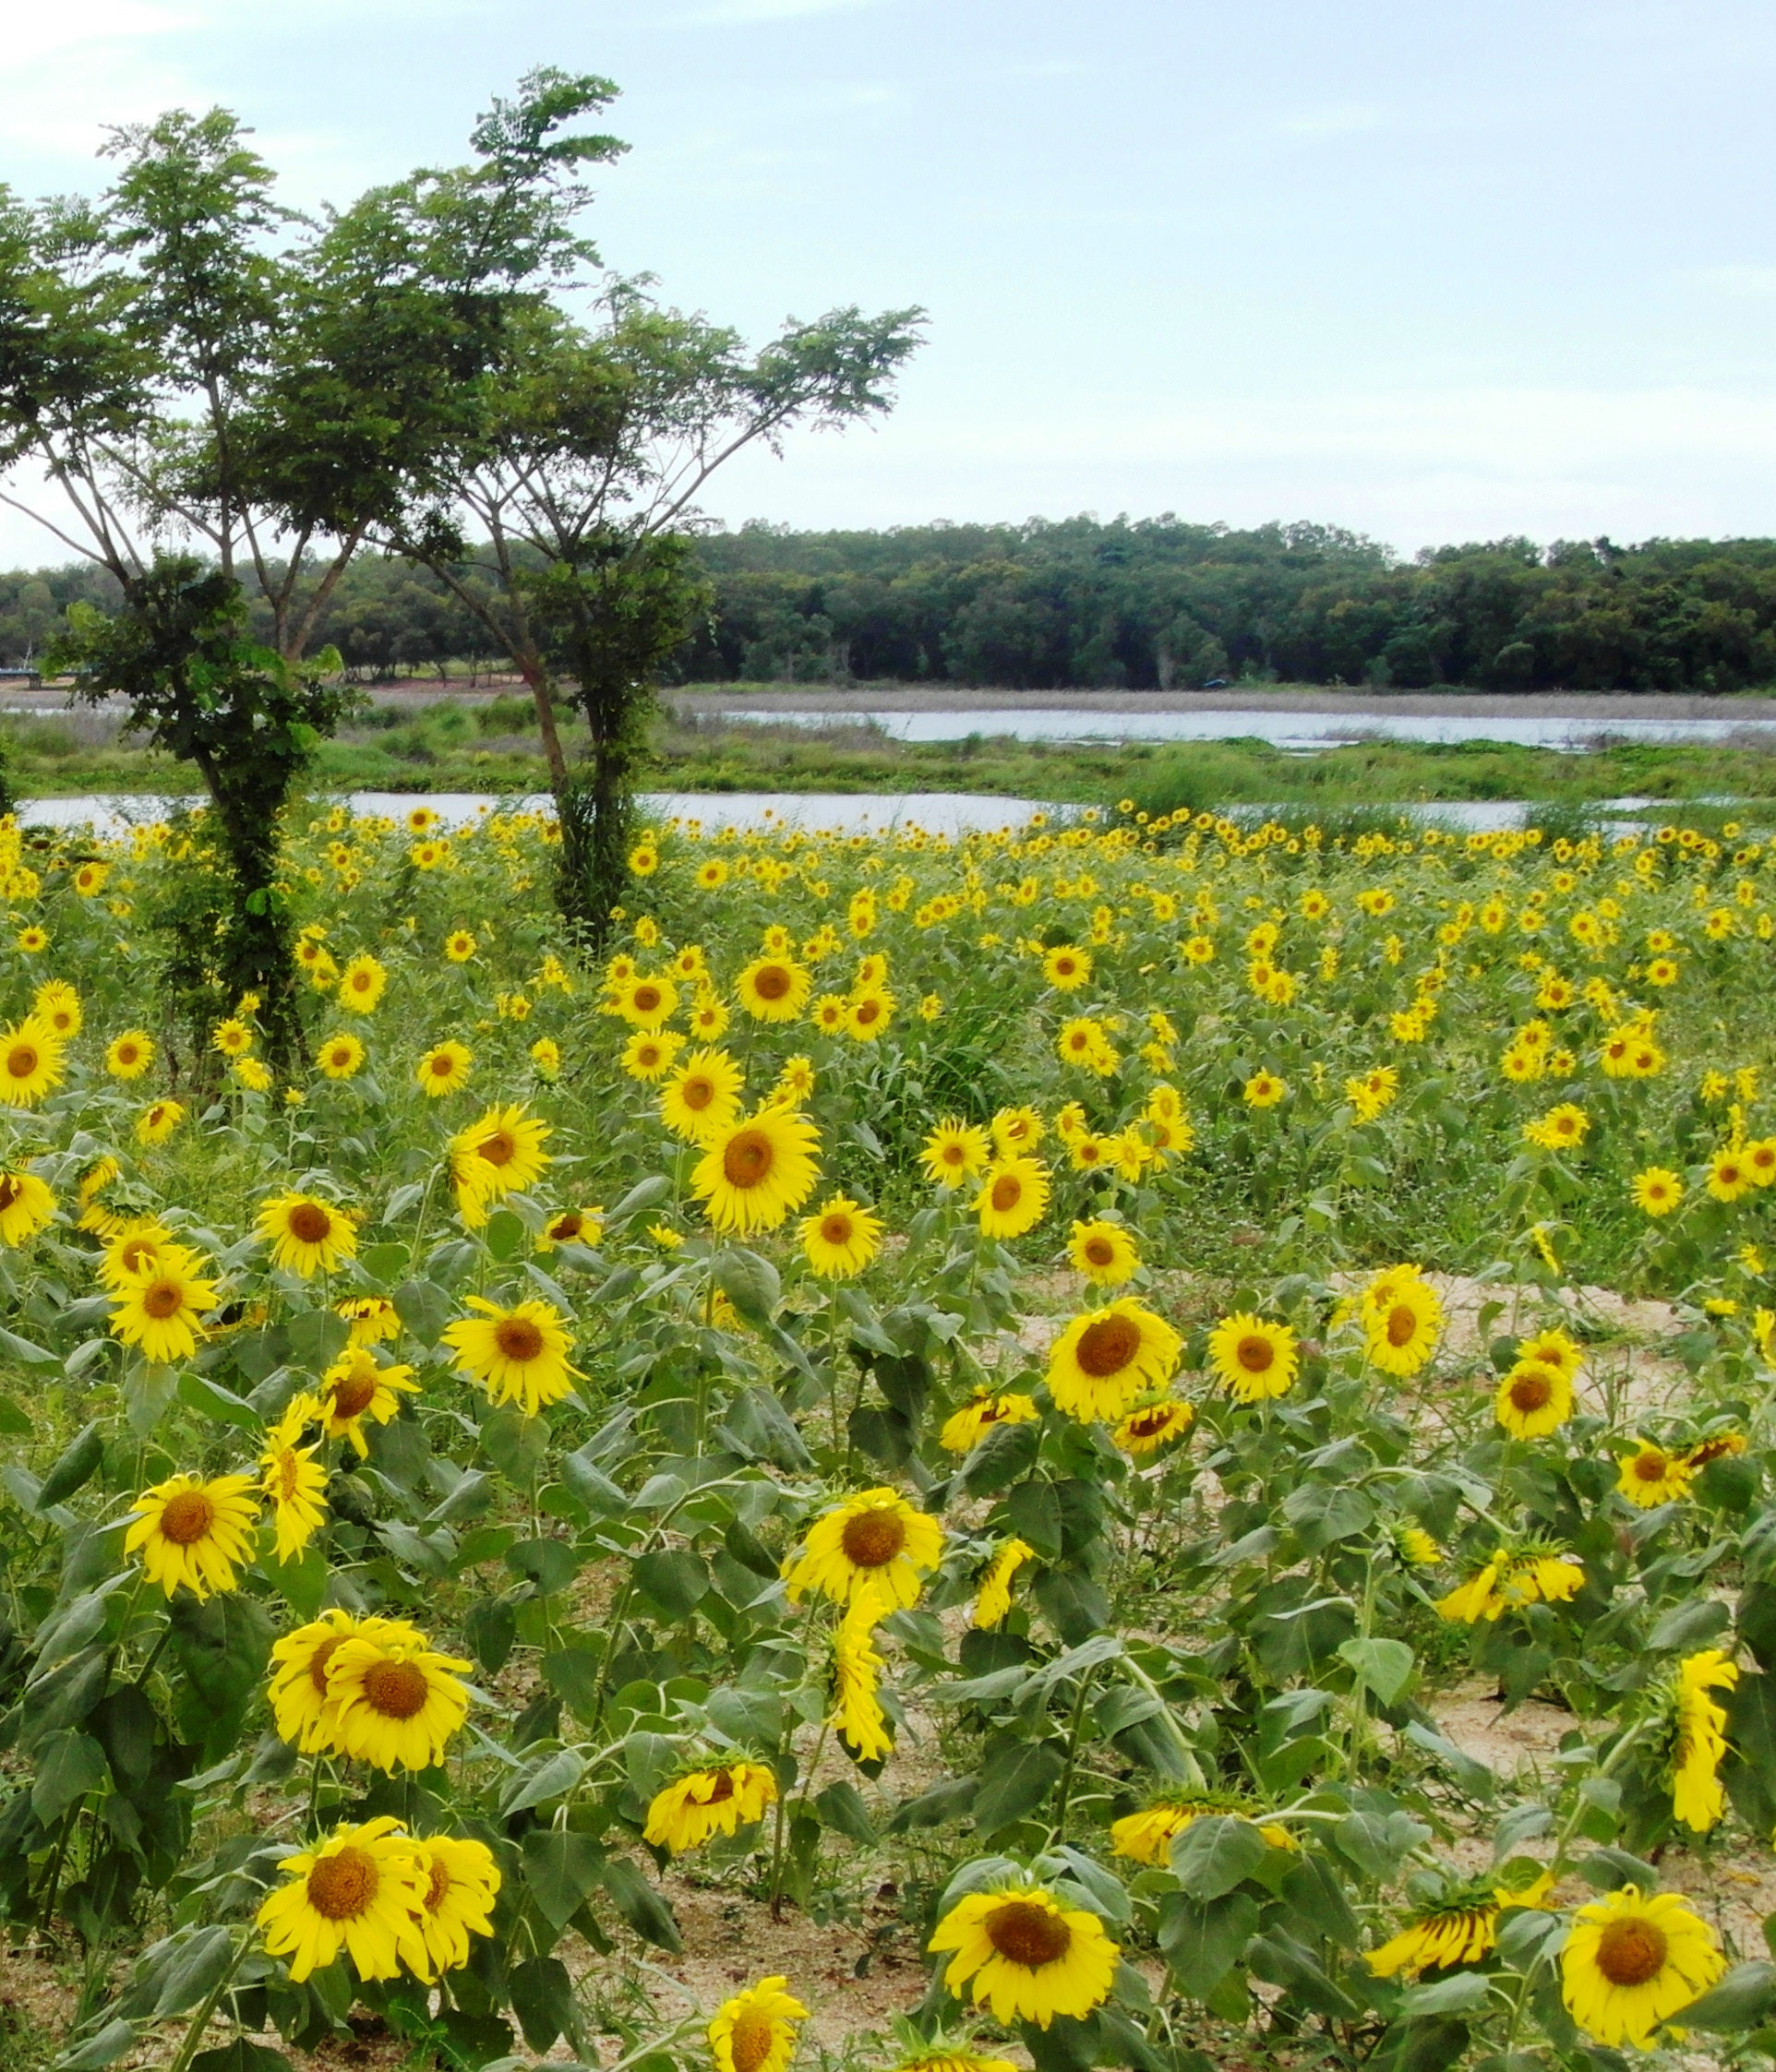 Sunflower Field, Growing, Sky, Sun, Water, HQ Photo